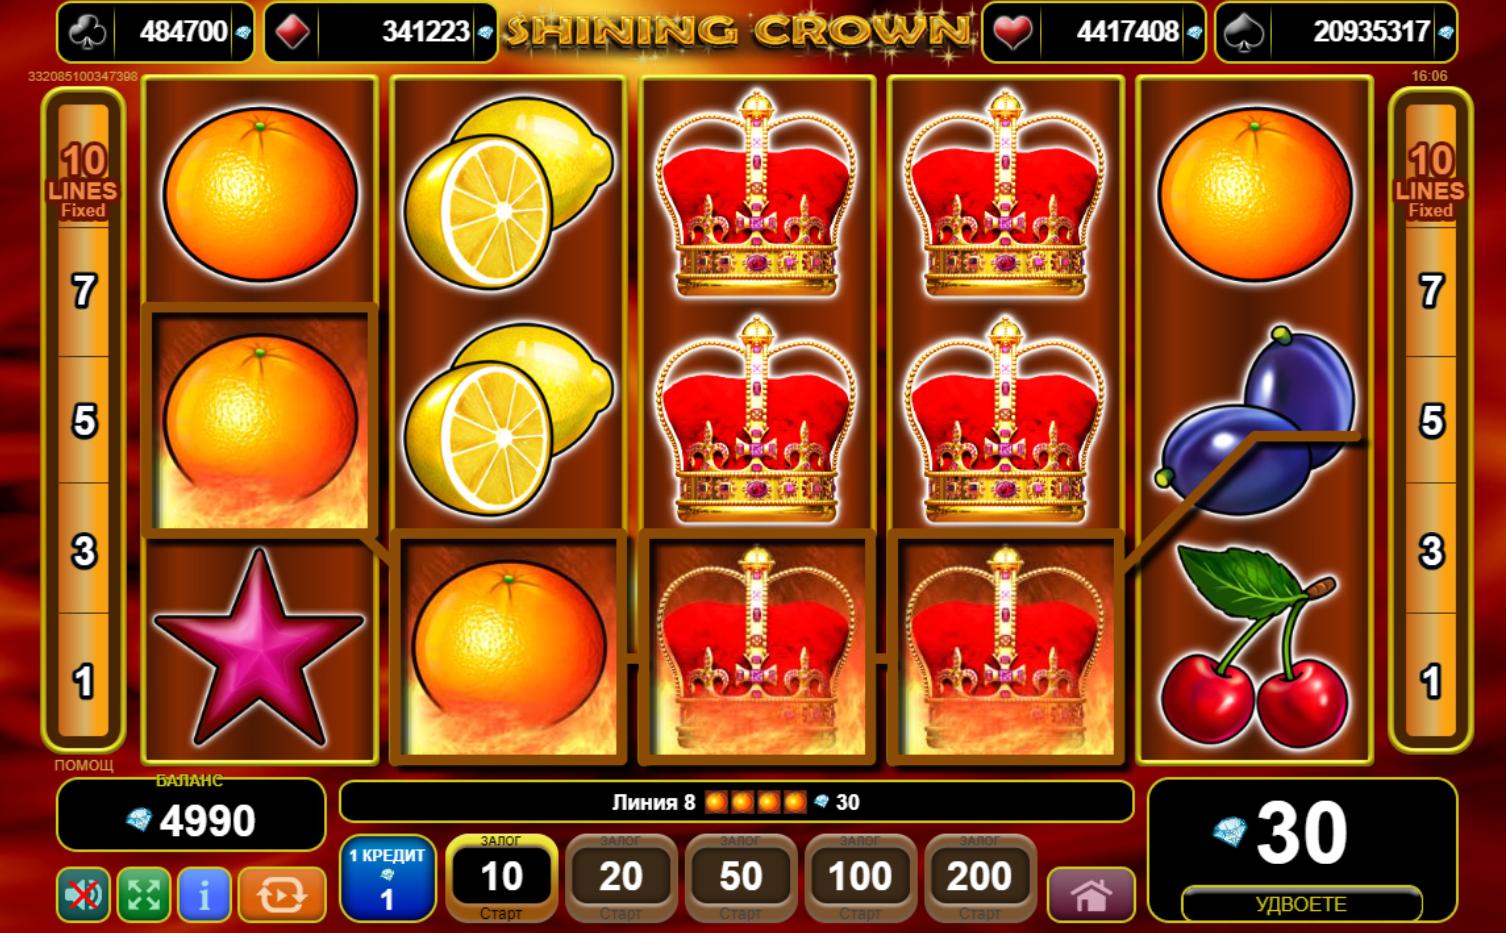 shining crown-komarbet.com